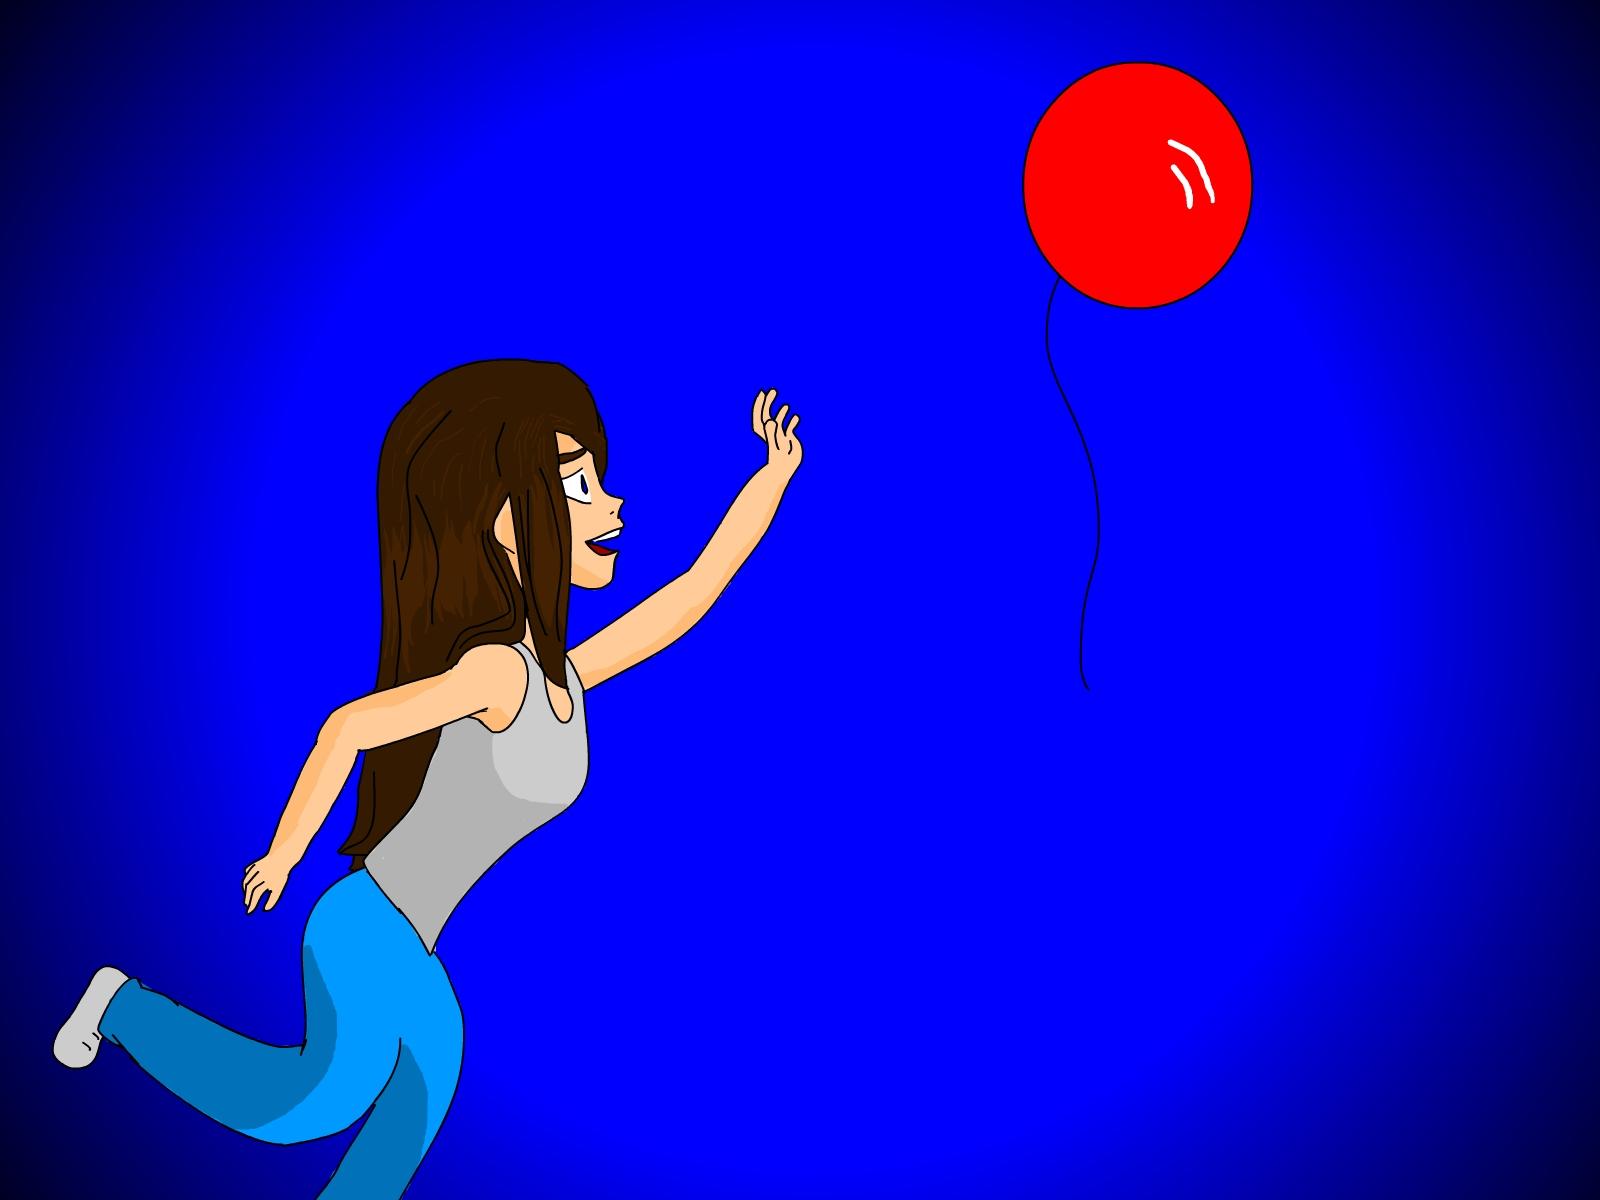 Mil balloon chase!